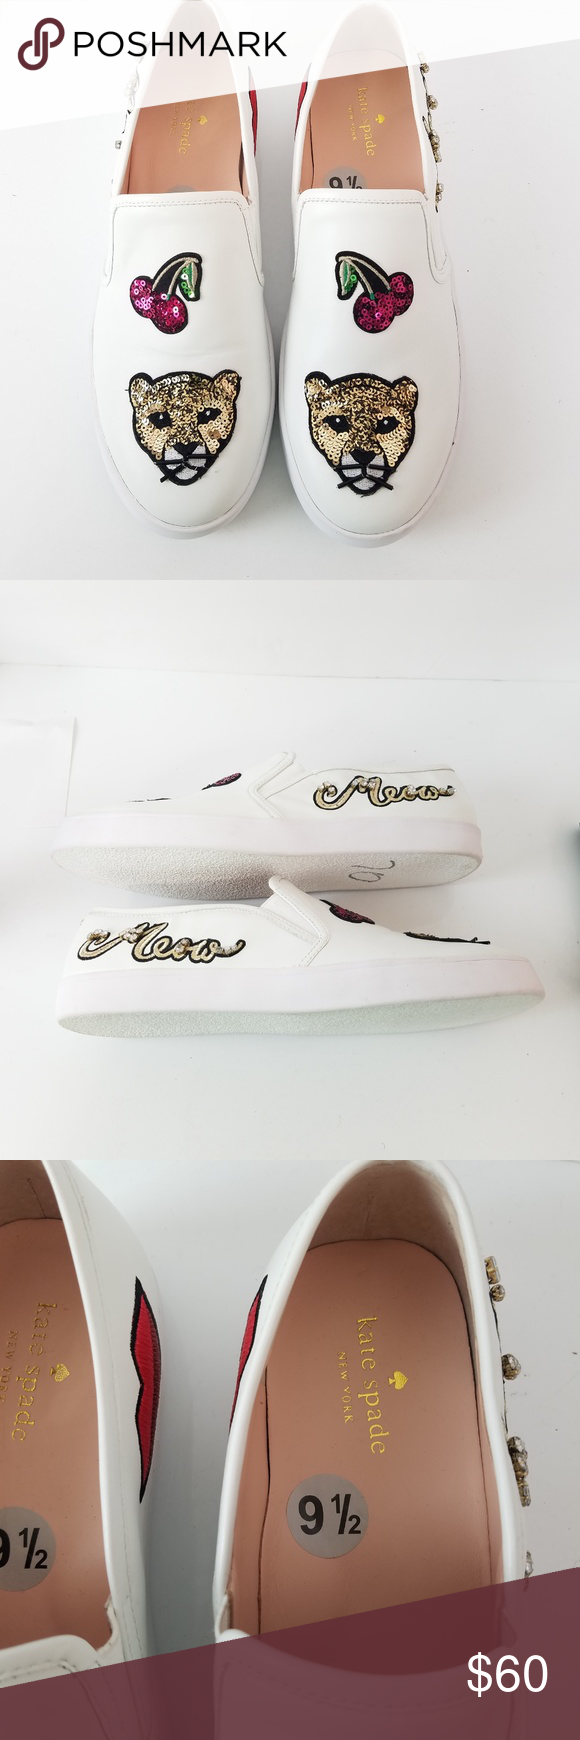 Kate Spade Slip On Cat Lizbeth Sneakers Leather Kate Spade